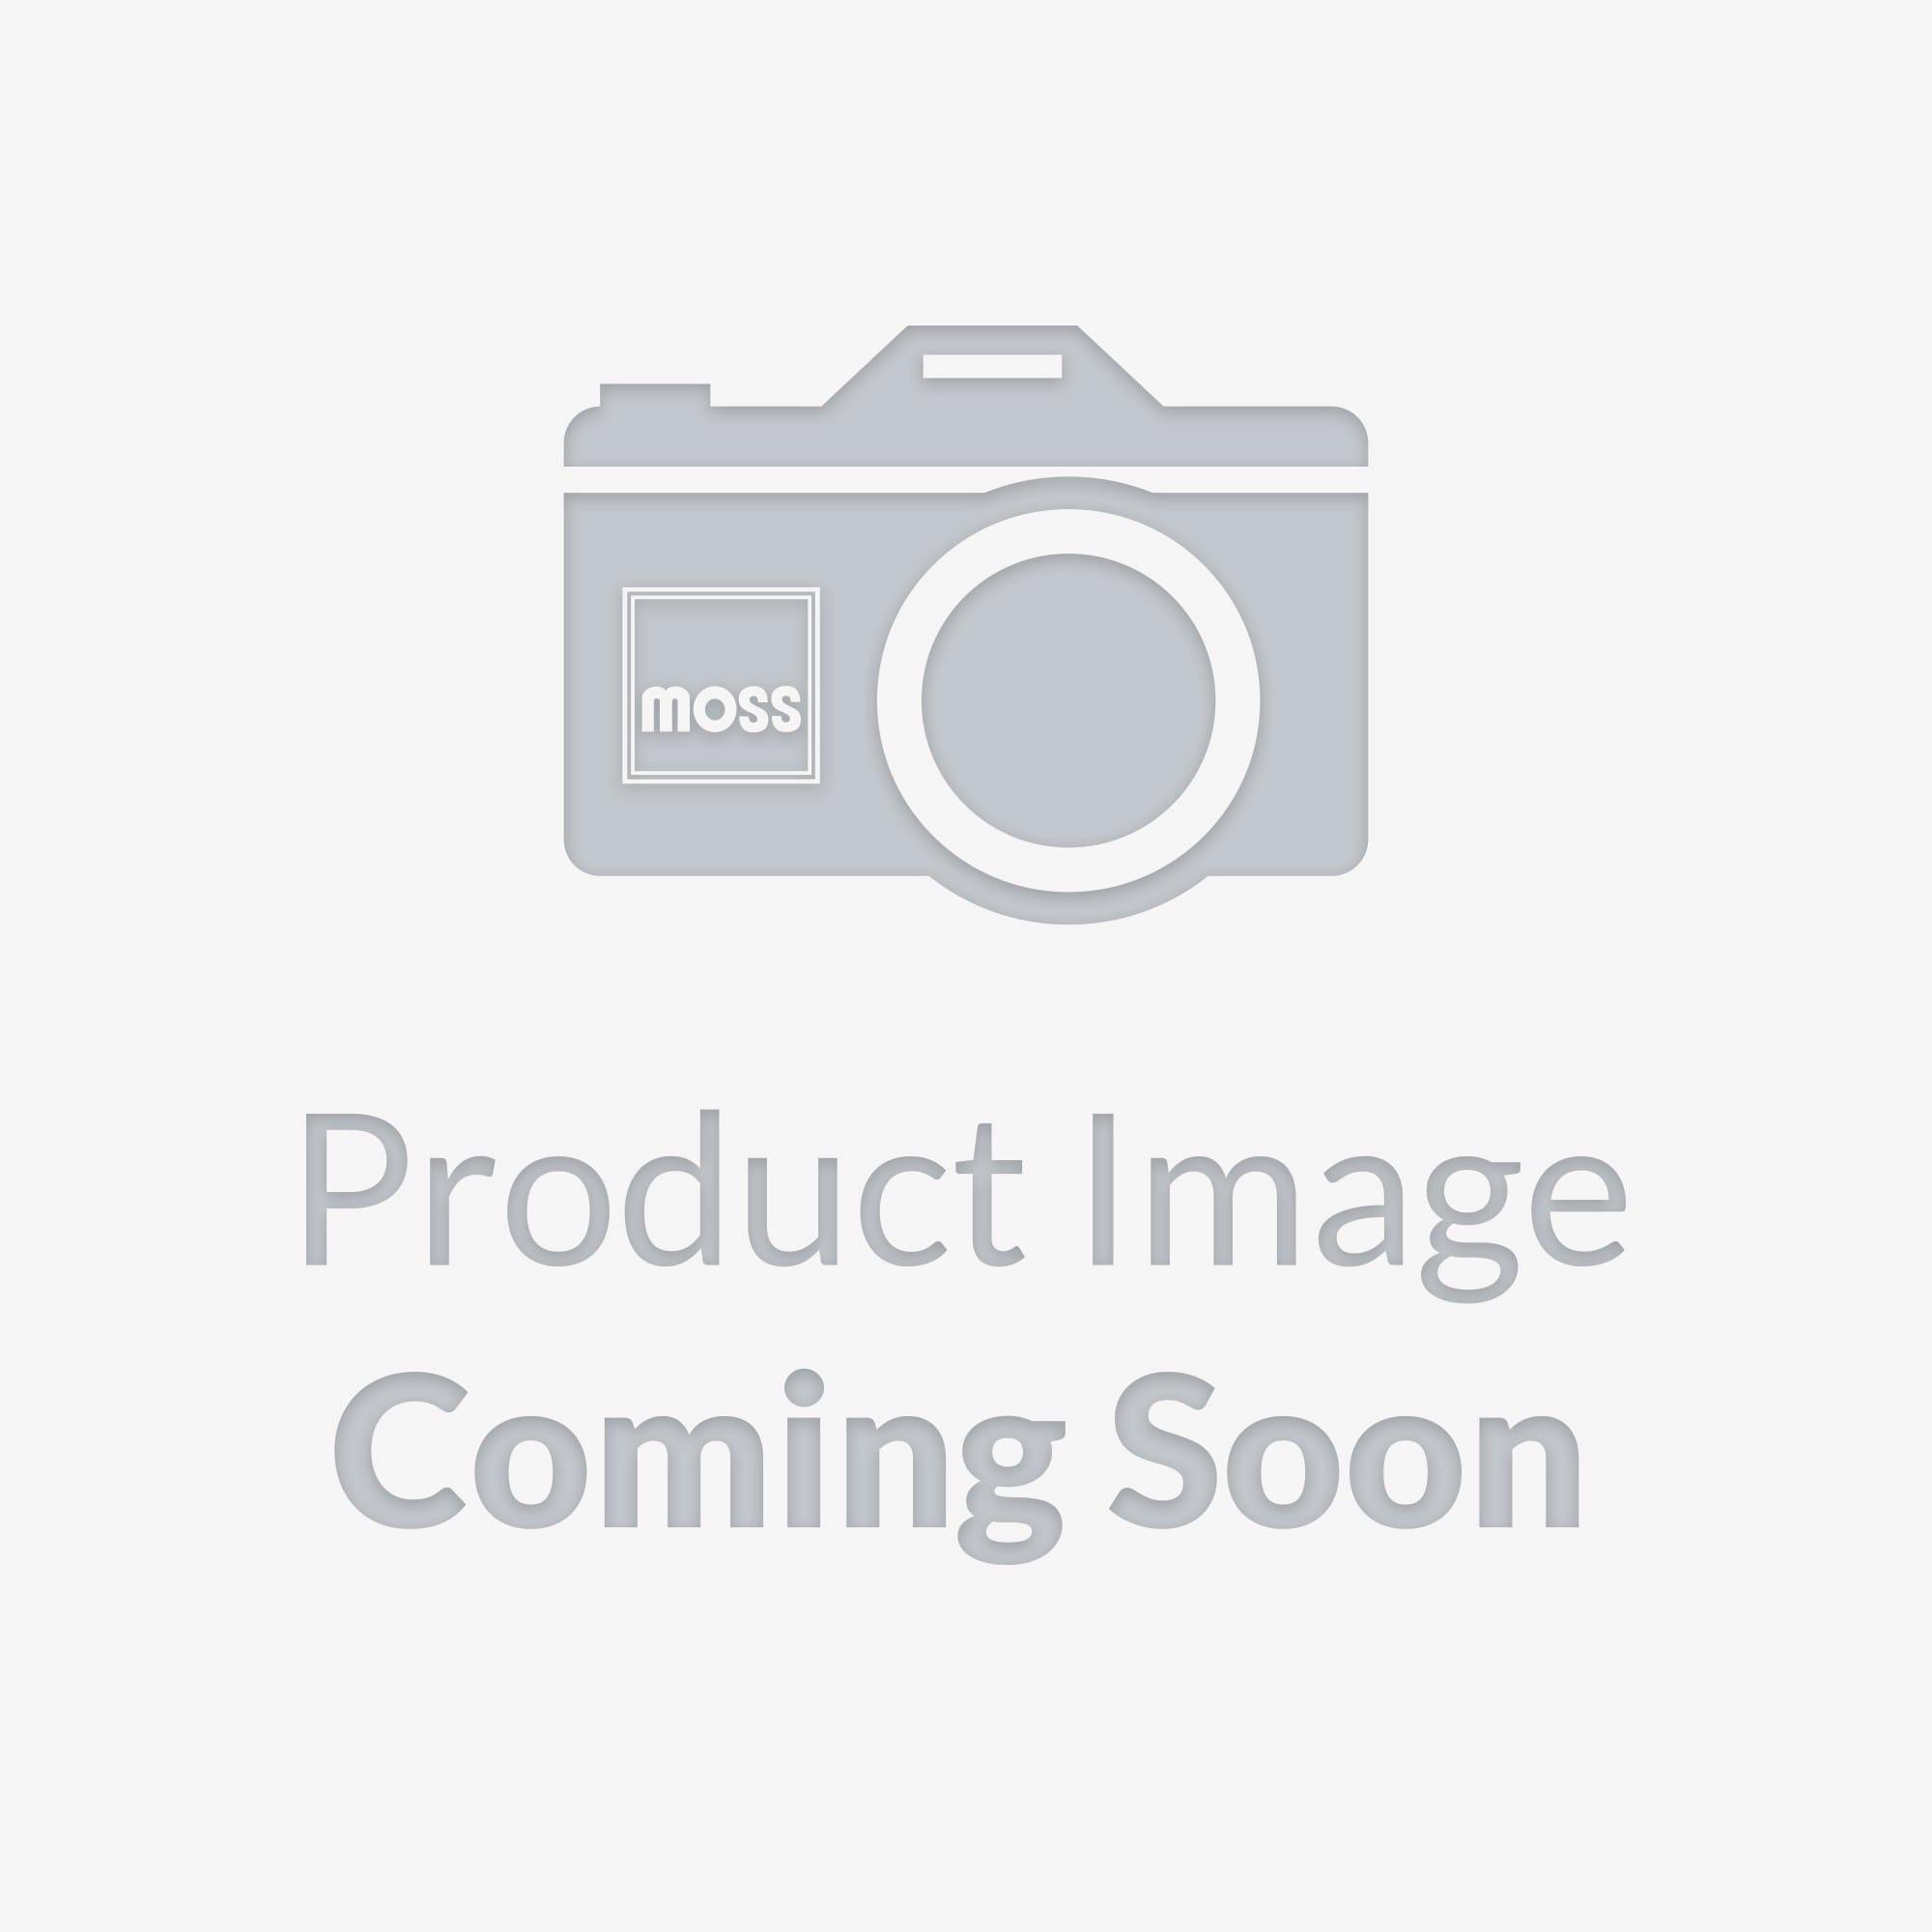 366-355 DRIVE EFI MGB Fuel Injection Kit by Cobalt   Moss Motors